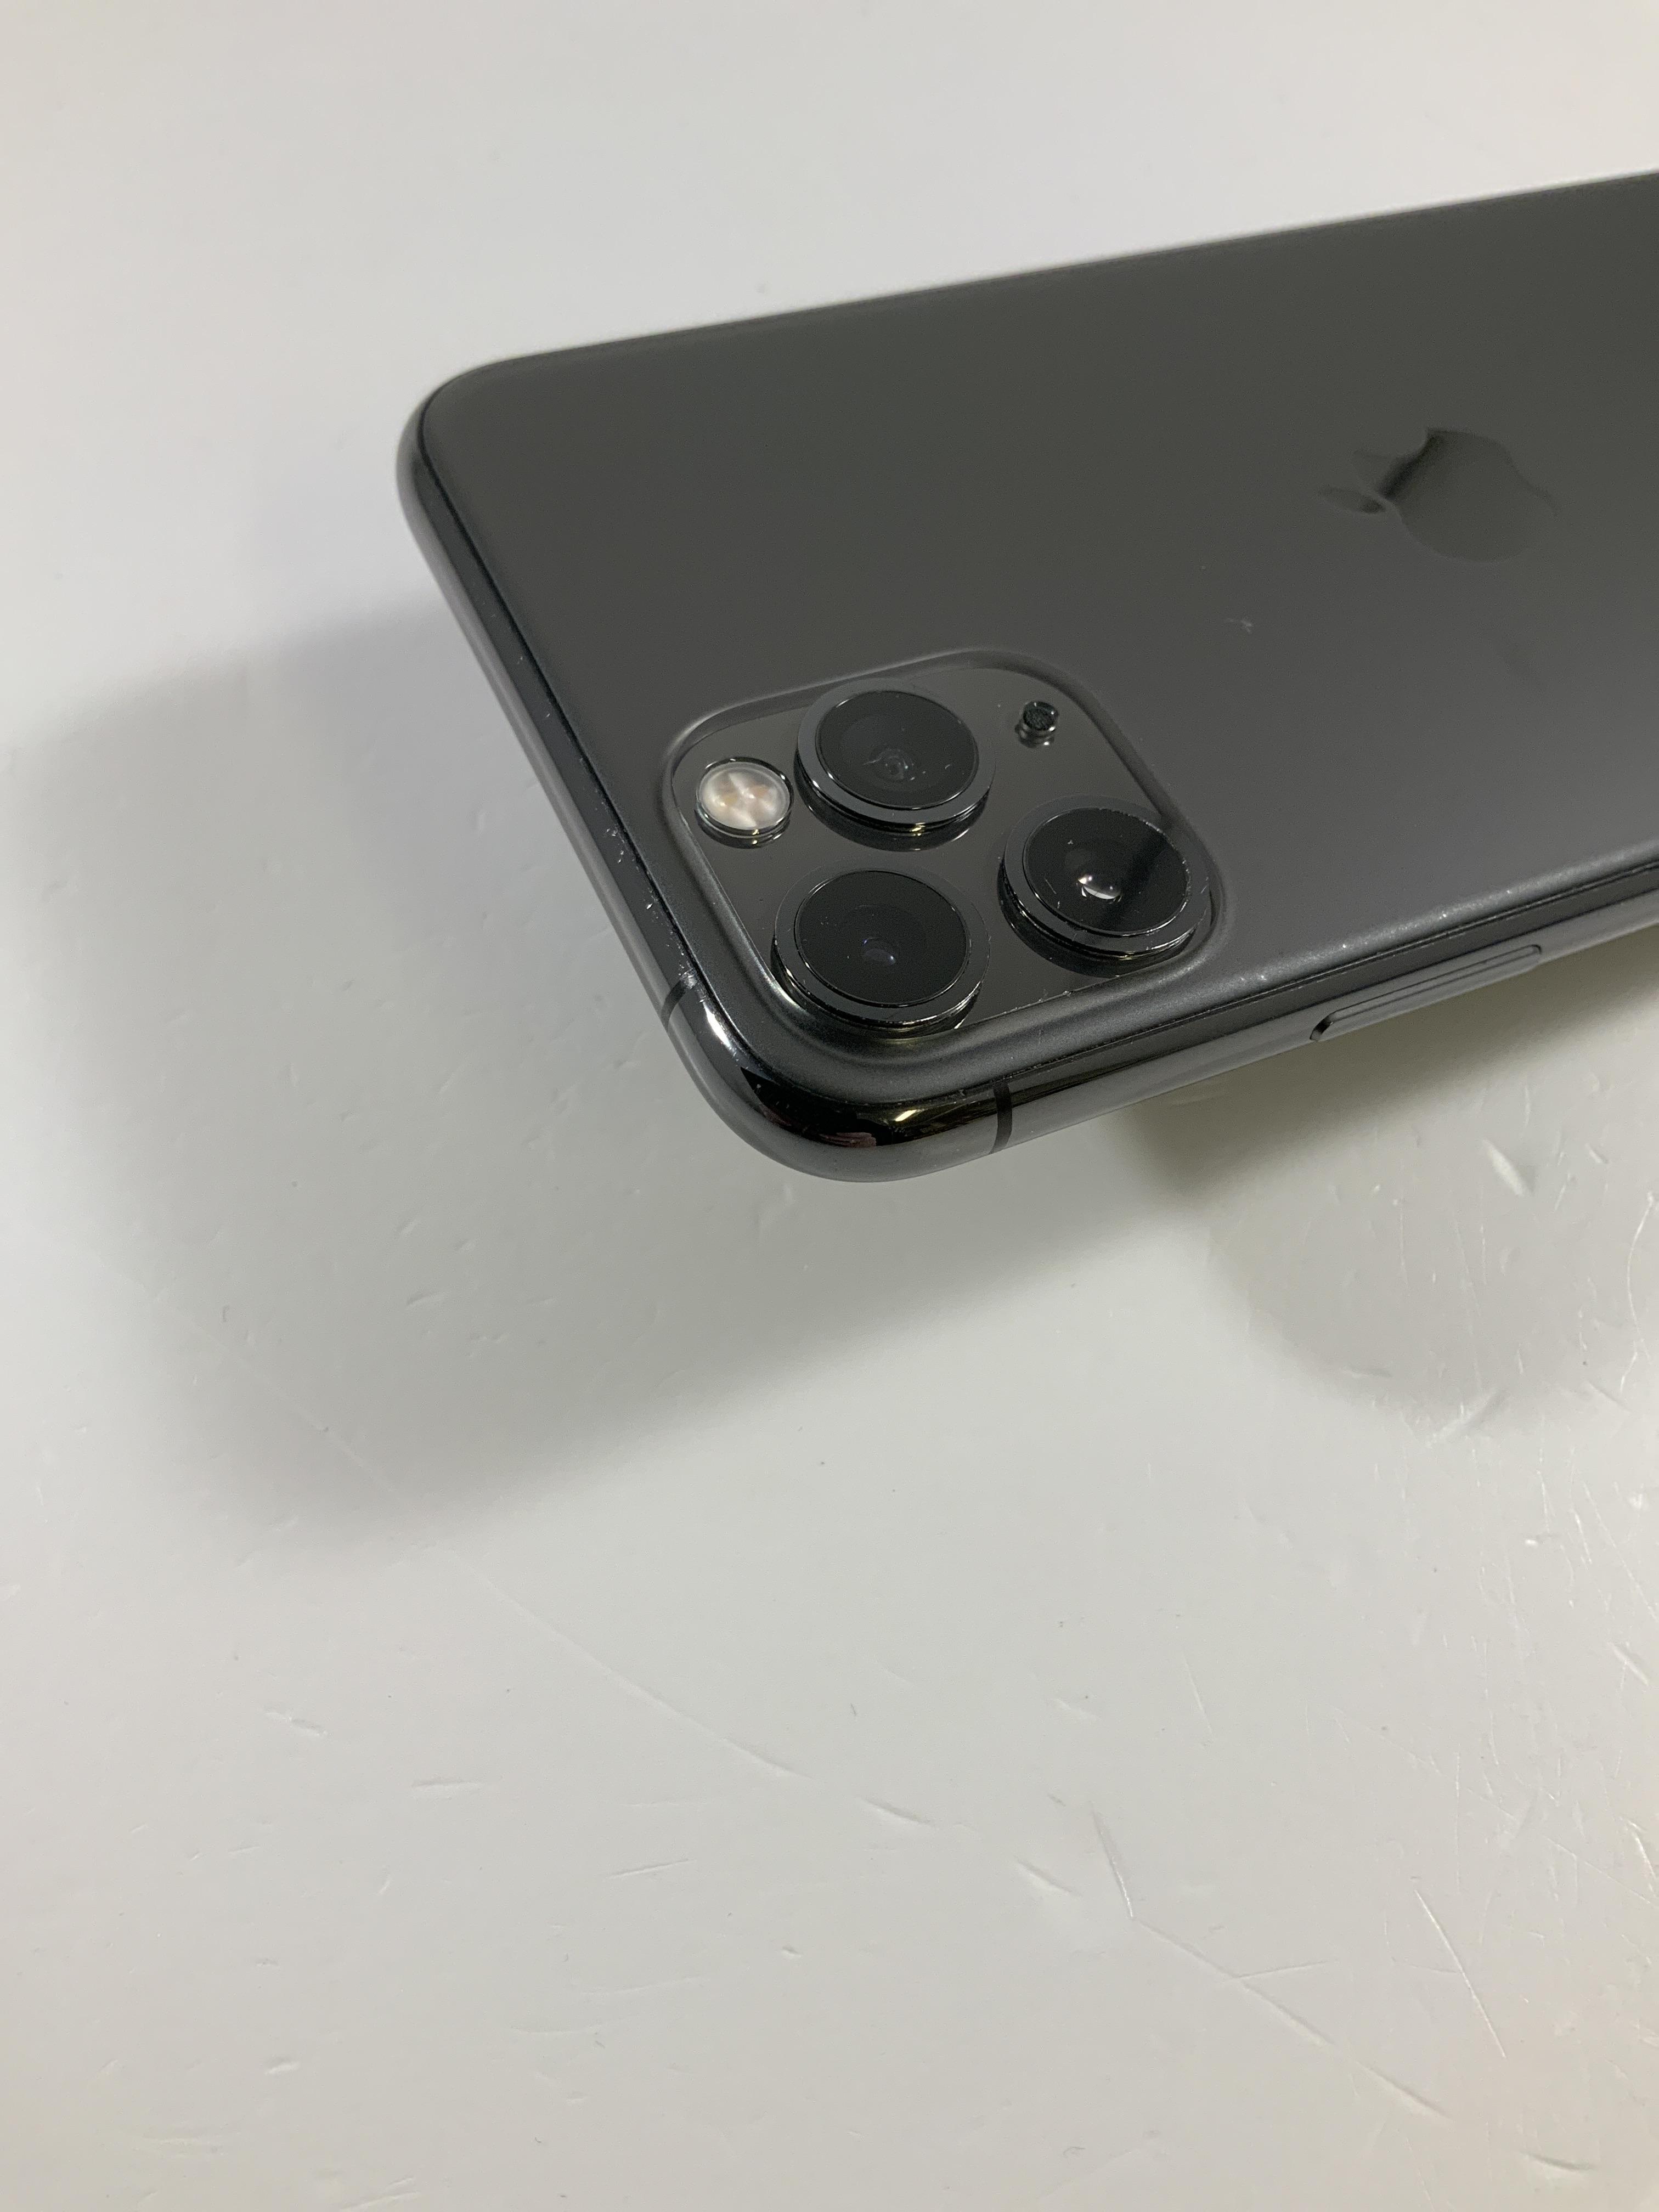 iPhone 11 Pro 64GB, 64GB, Space Gray, Afbeelding 4